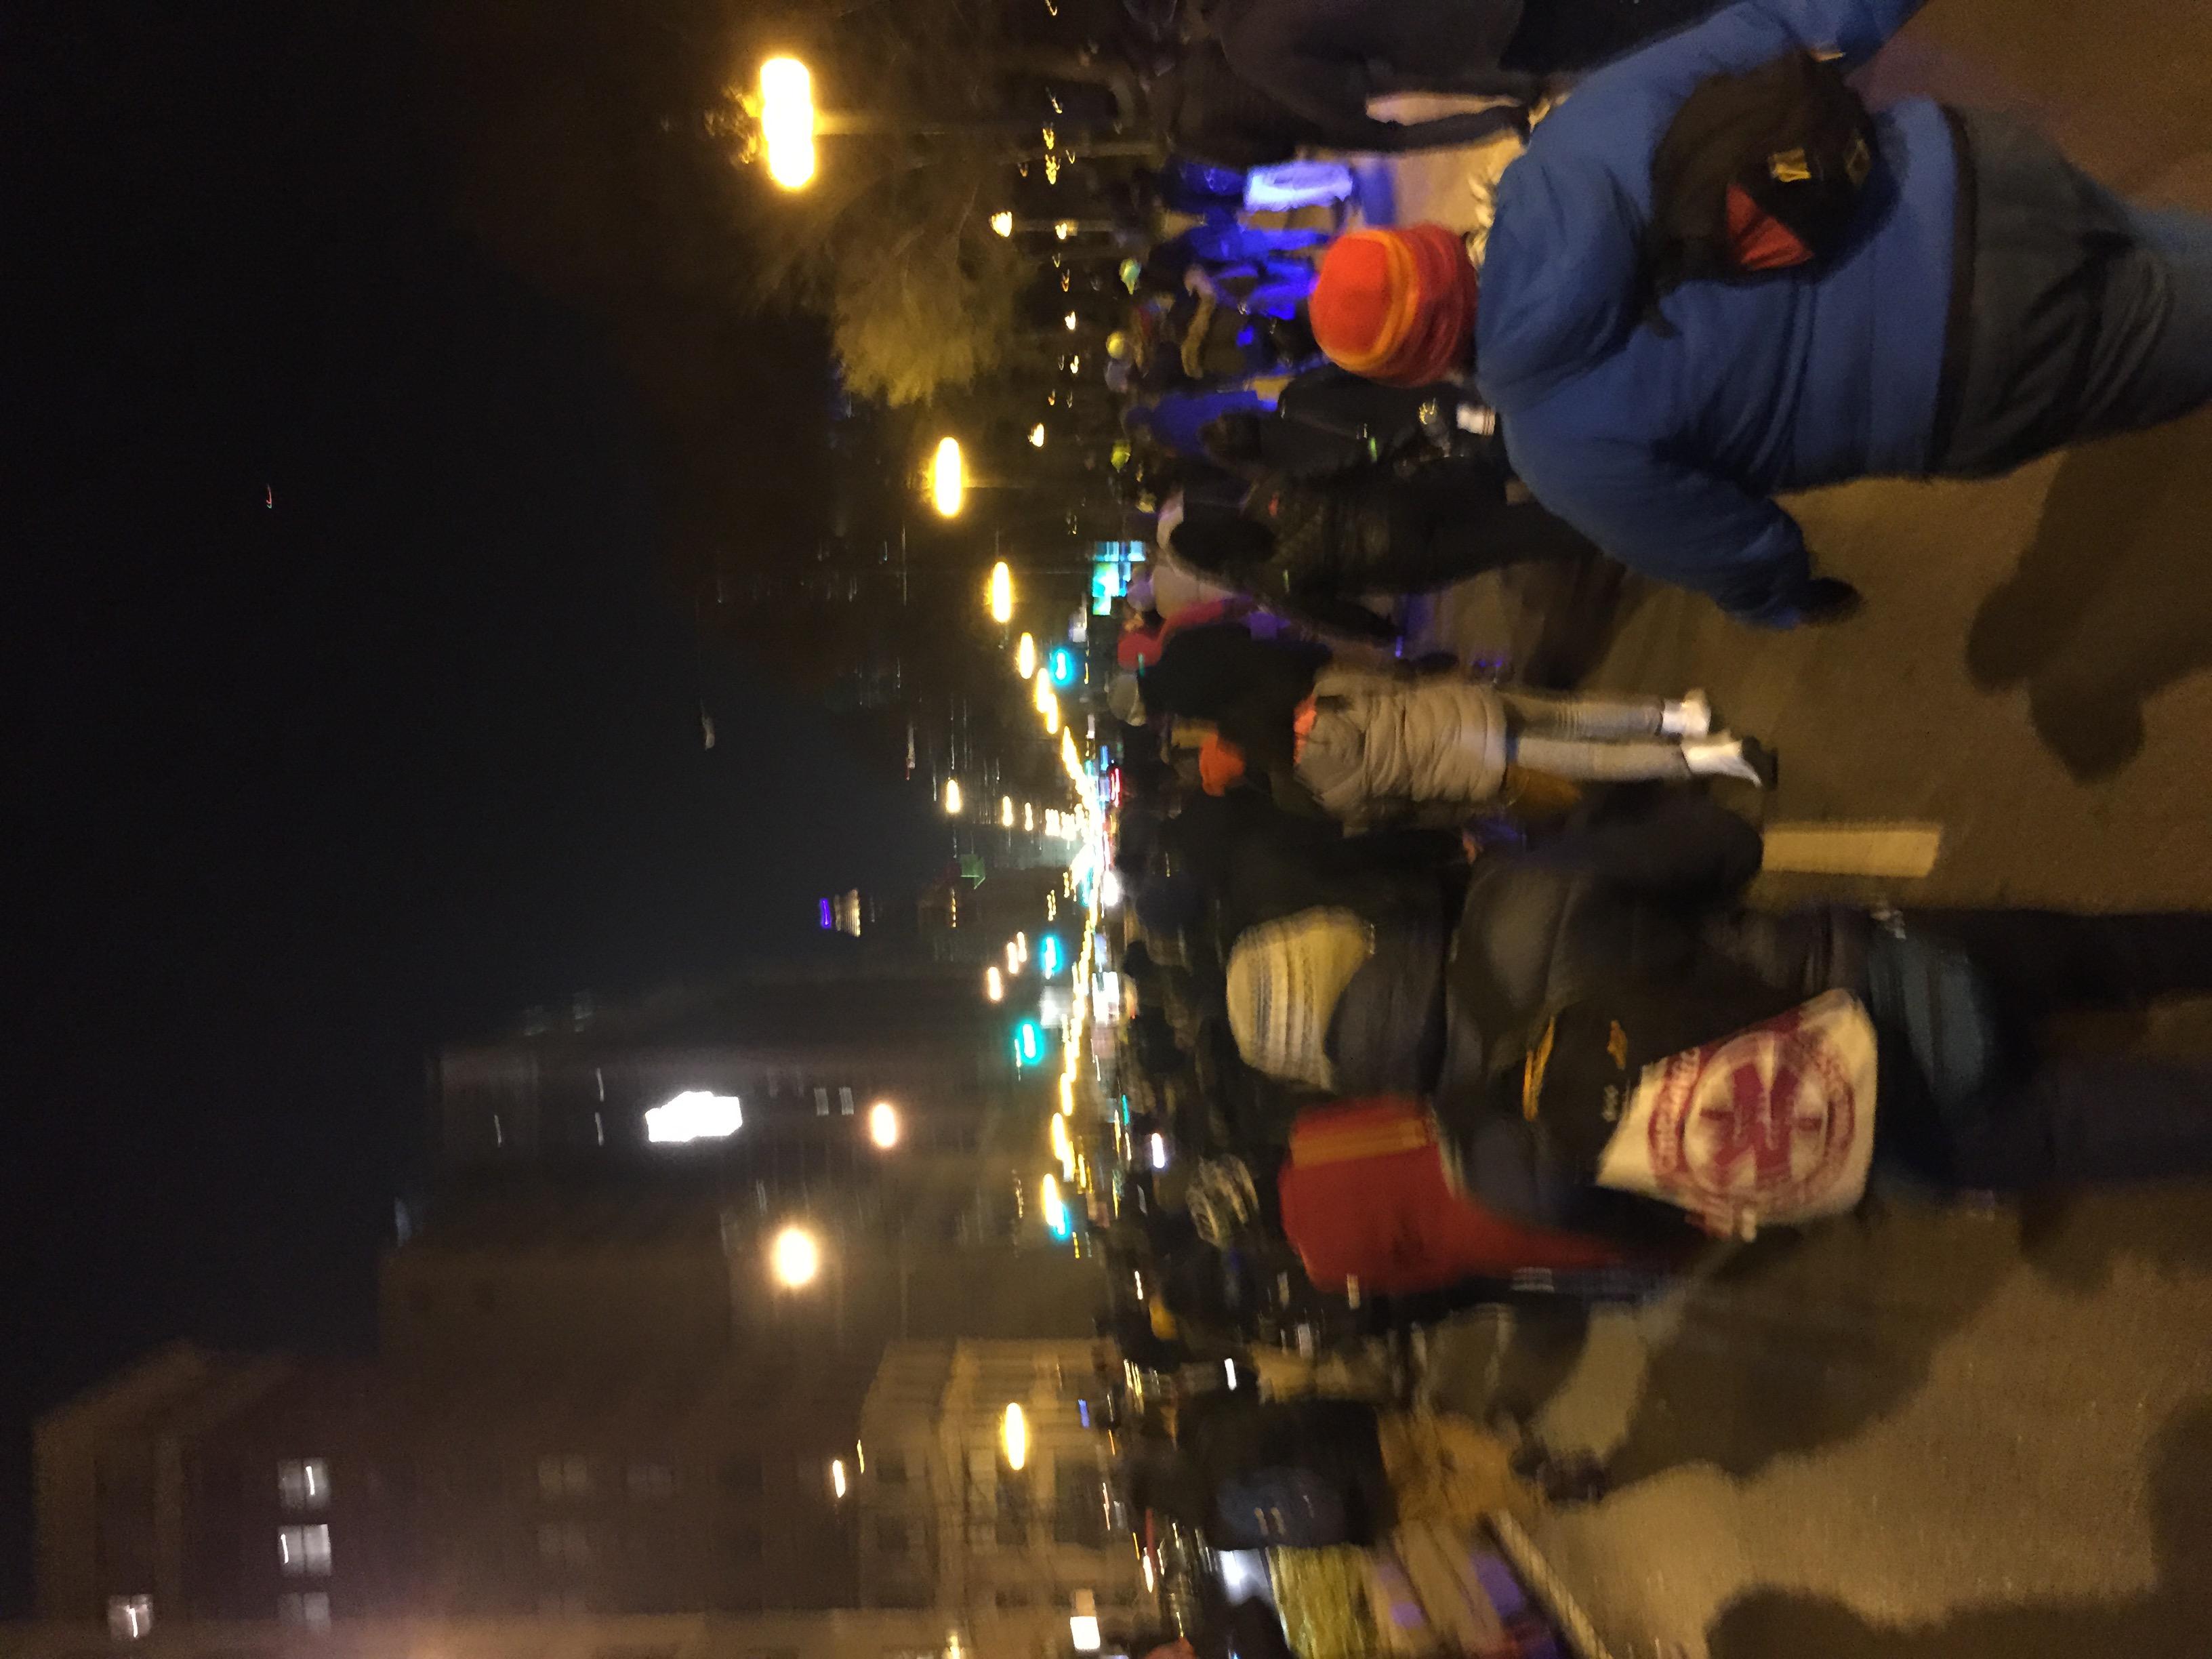 chicago protest - november 24, 2015 - michigan ave.jpg